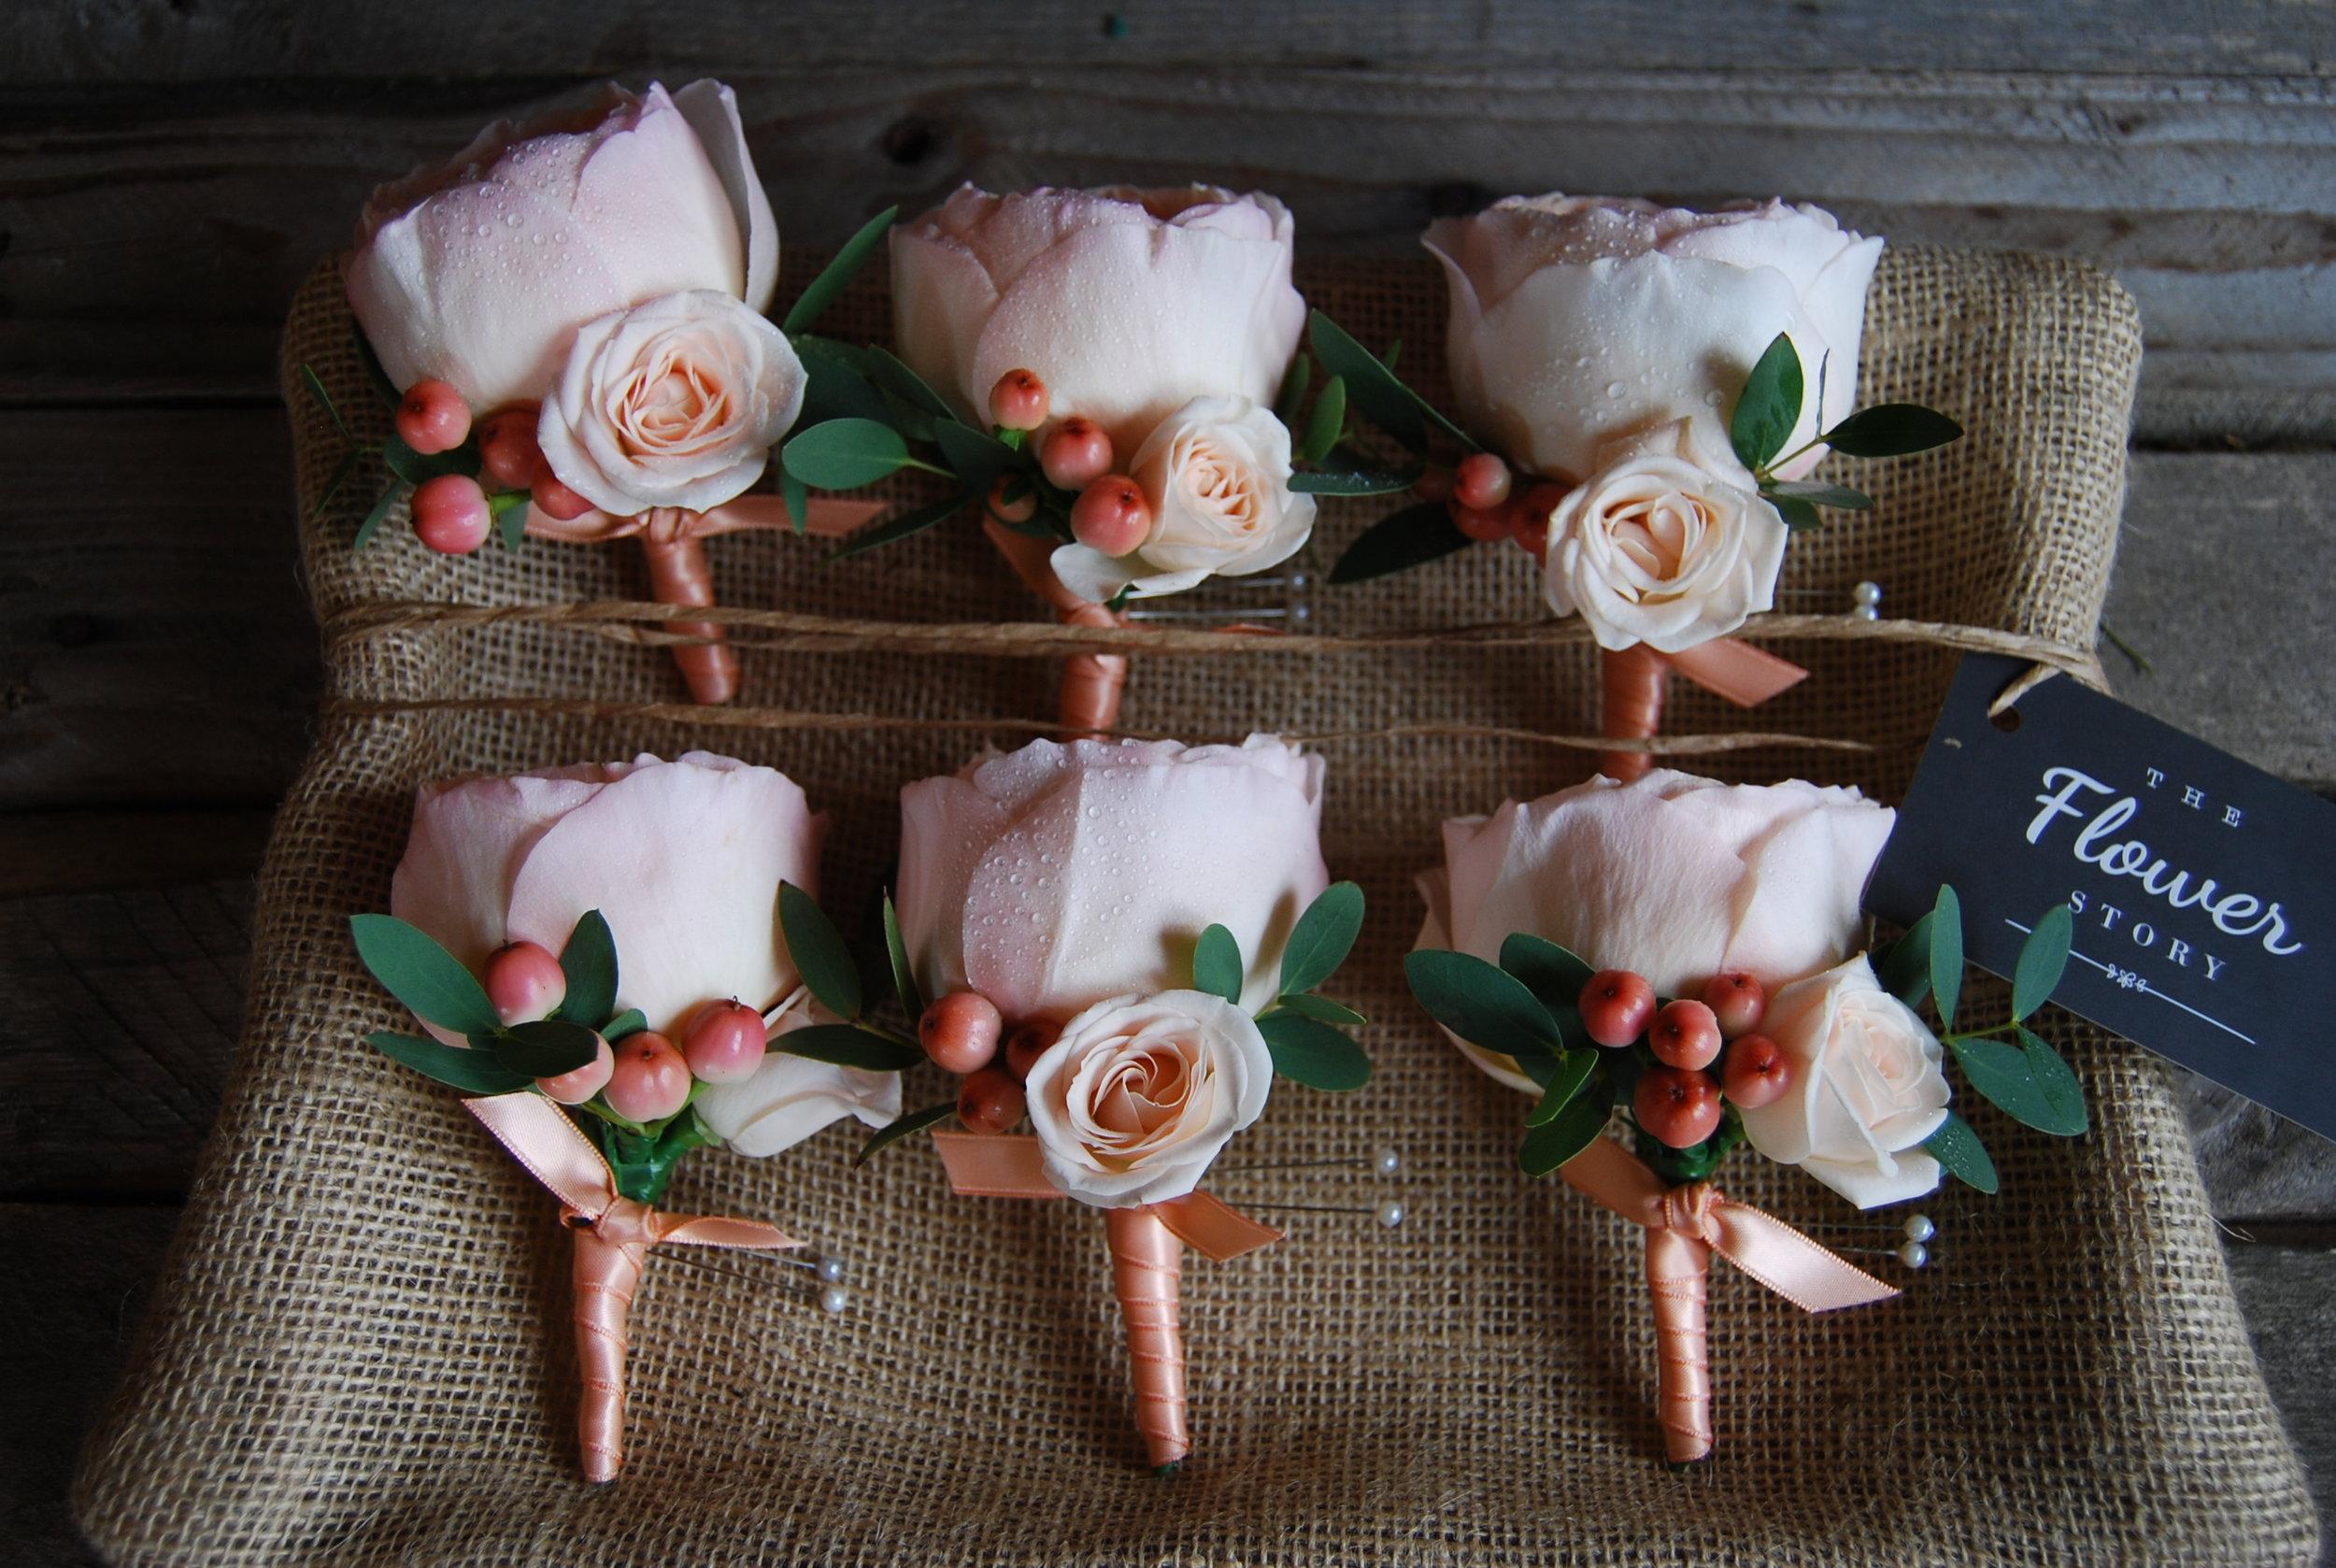 'Juliet' garden rose buttonholes for the boys